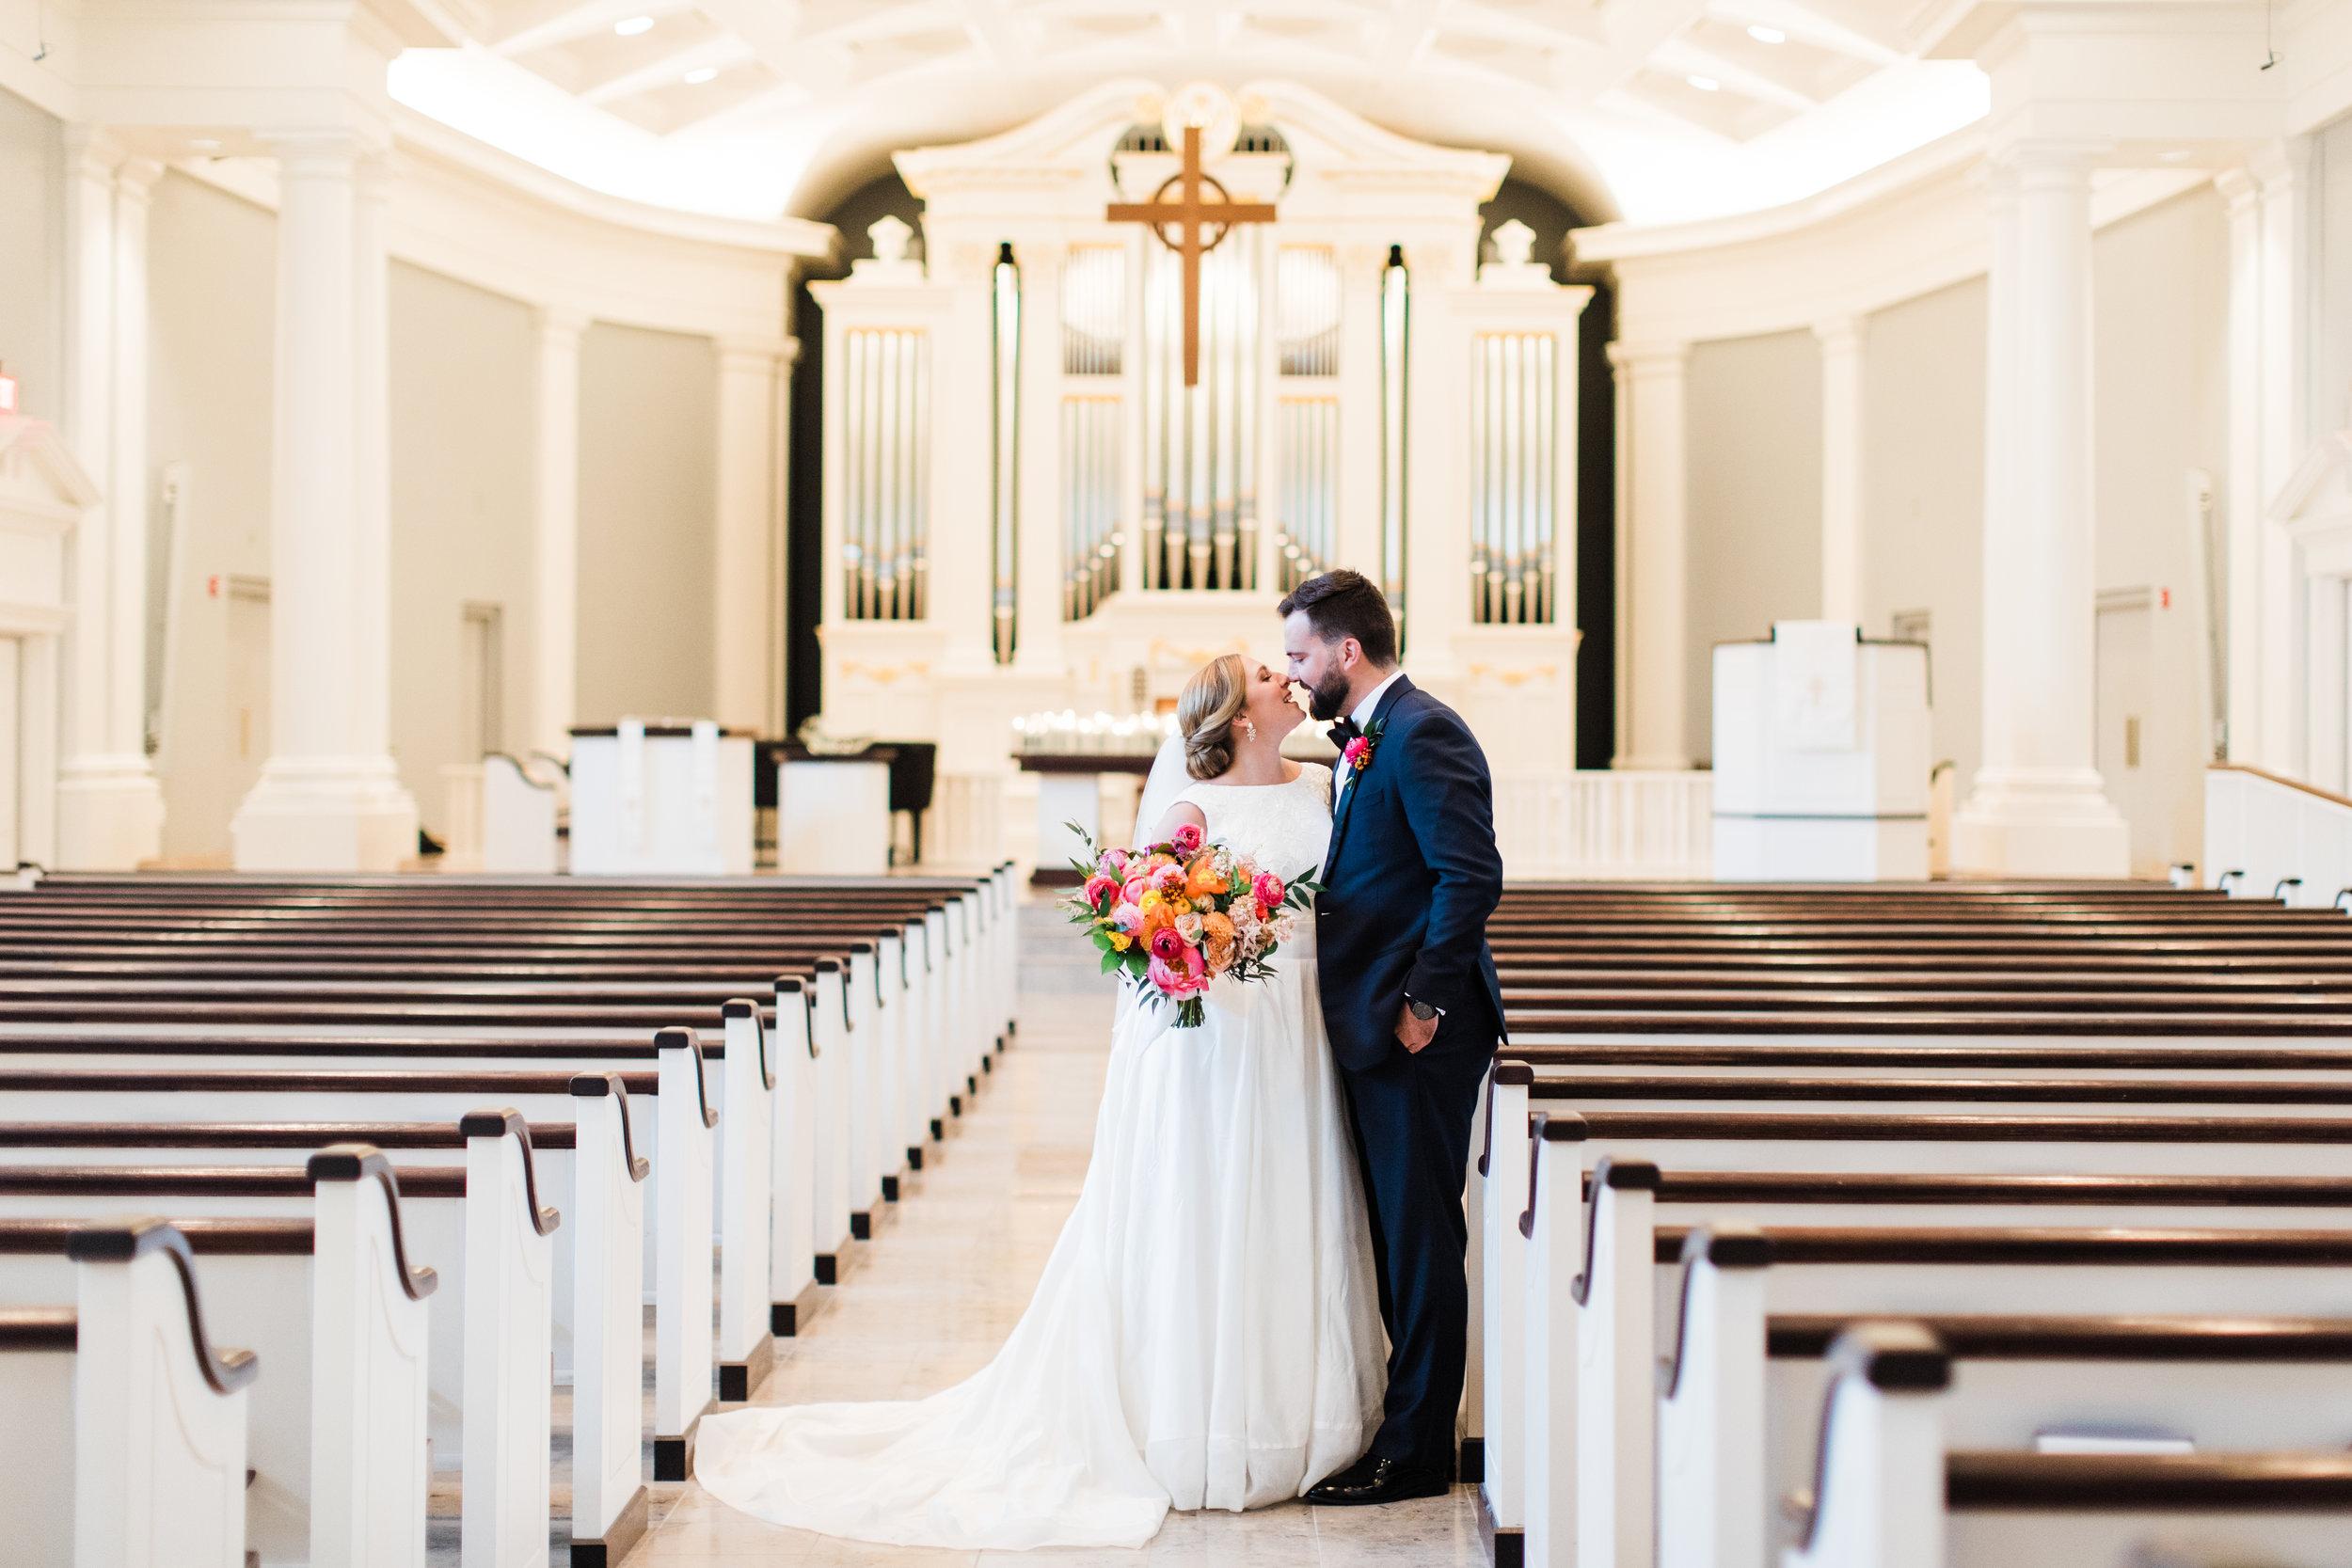 KLIMES WEDDING - MARISSA CRIBBS PHOTOGRAPHY-344.jpg